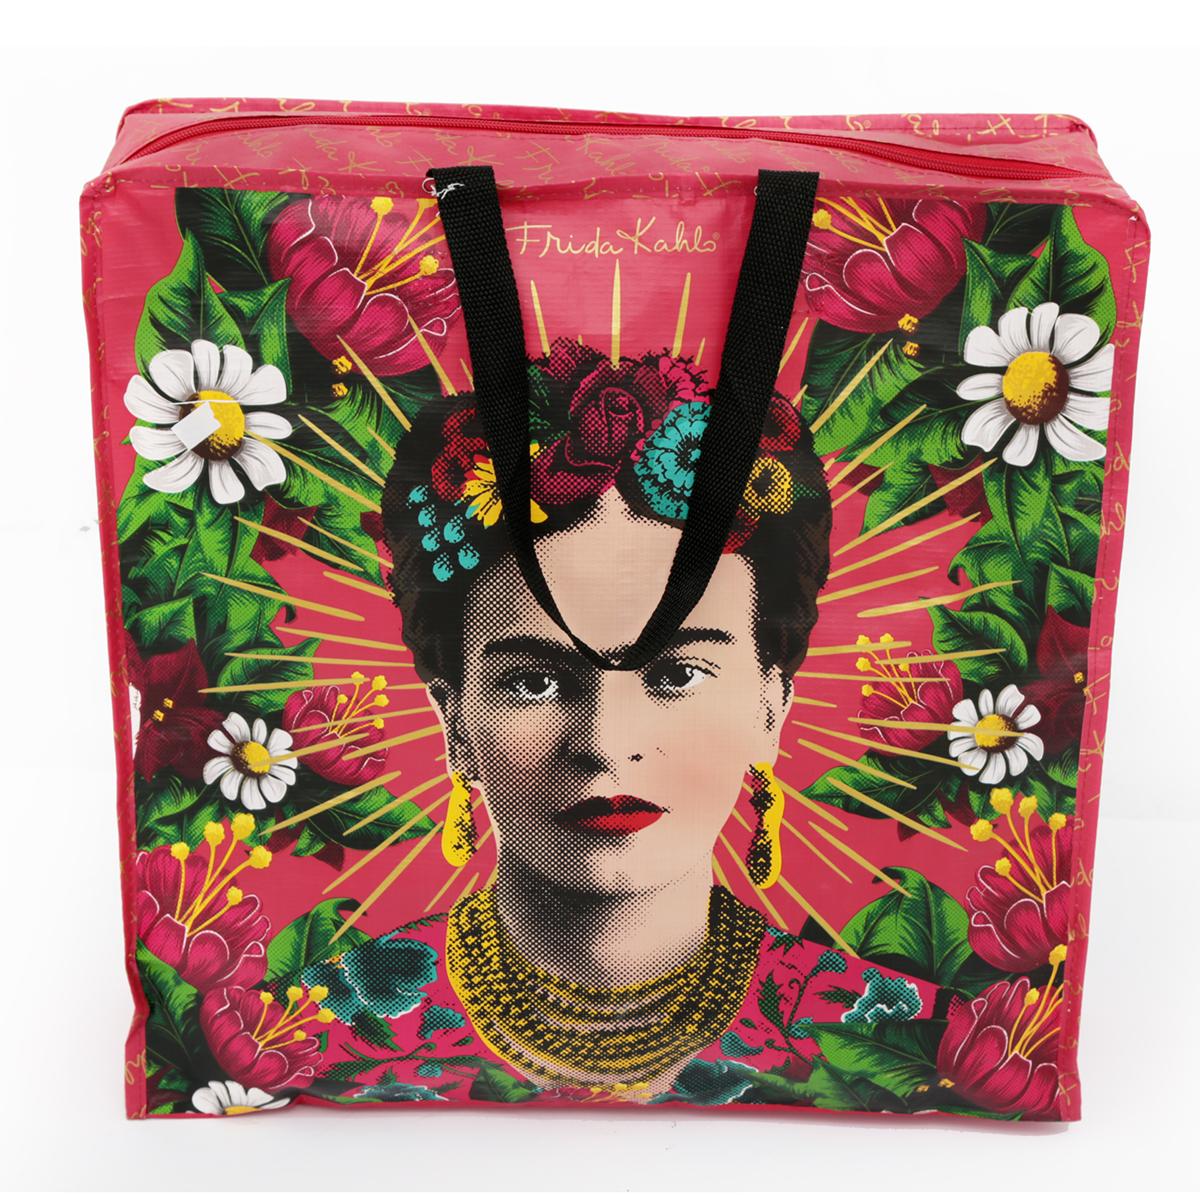 Sac Shopping rétro \'Frida Kahlo\' multicolore - 45x45x15 cm - [A0029]